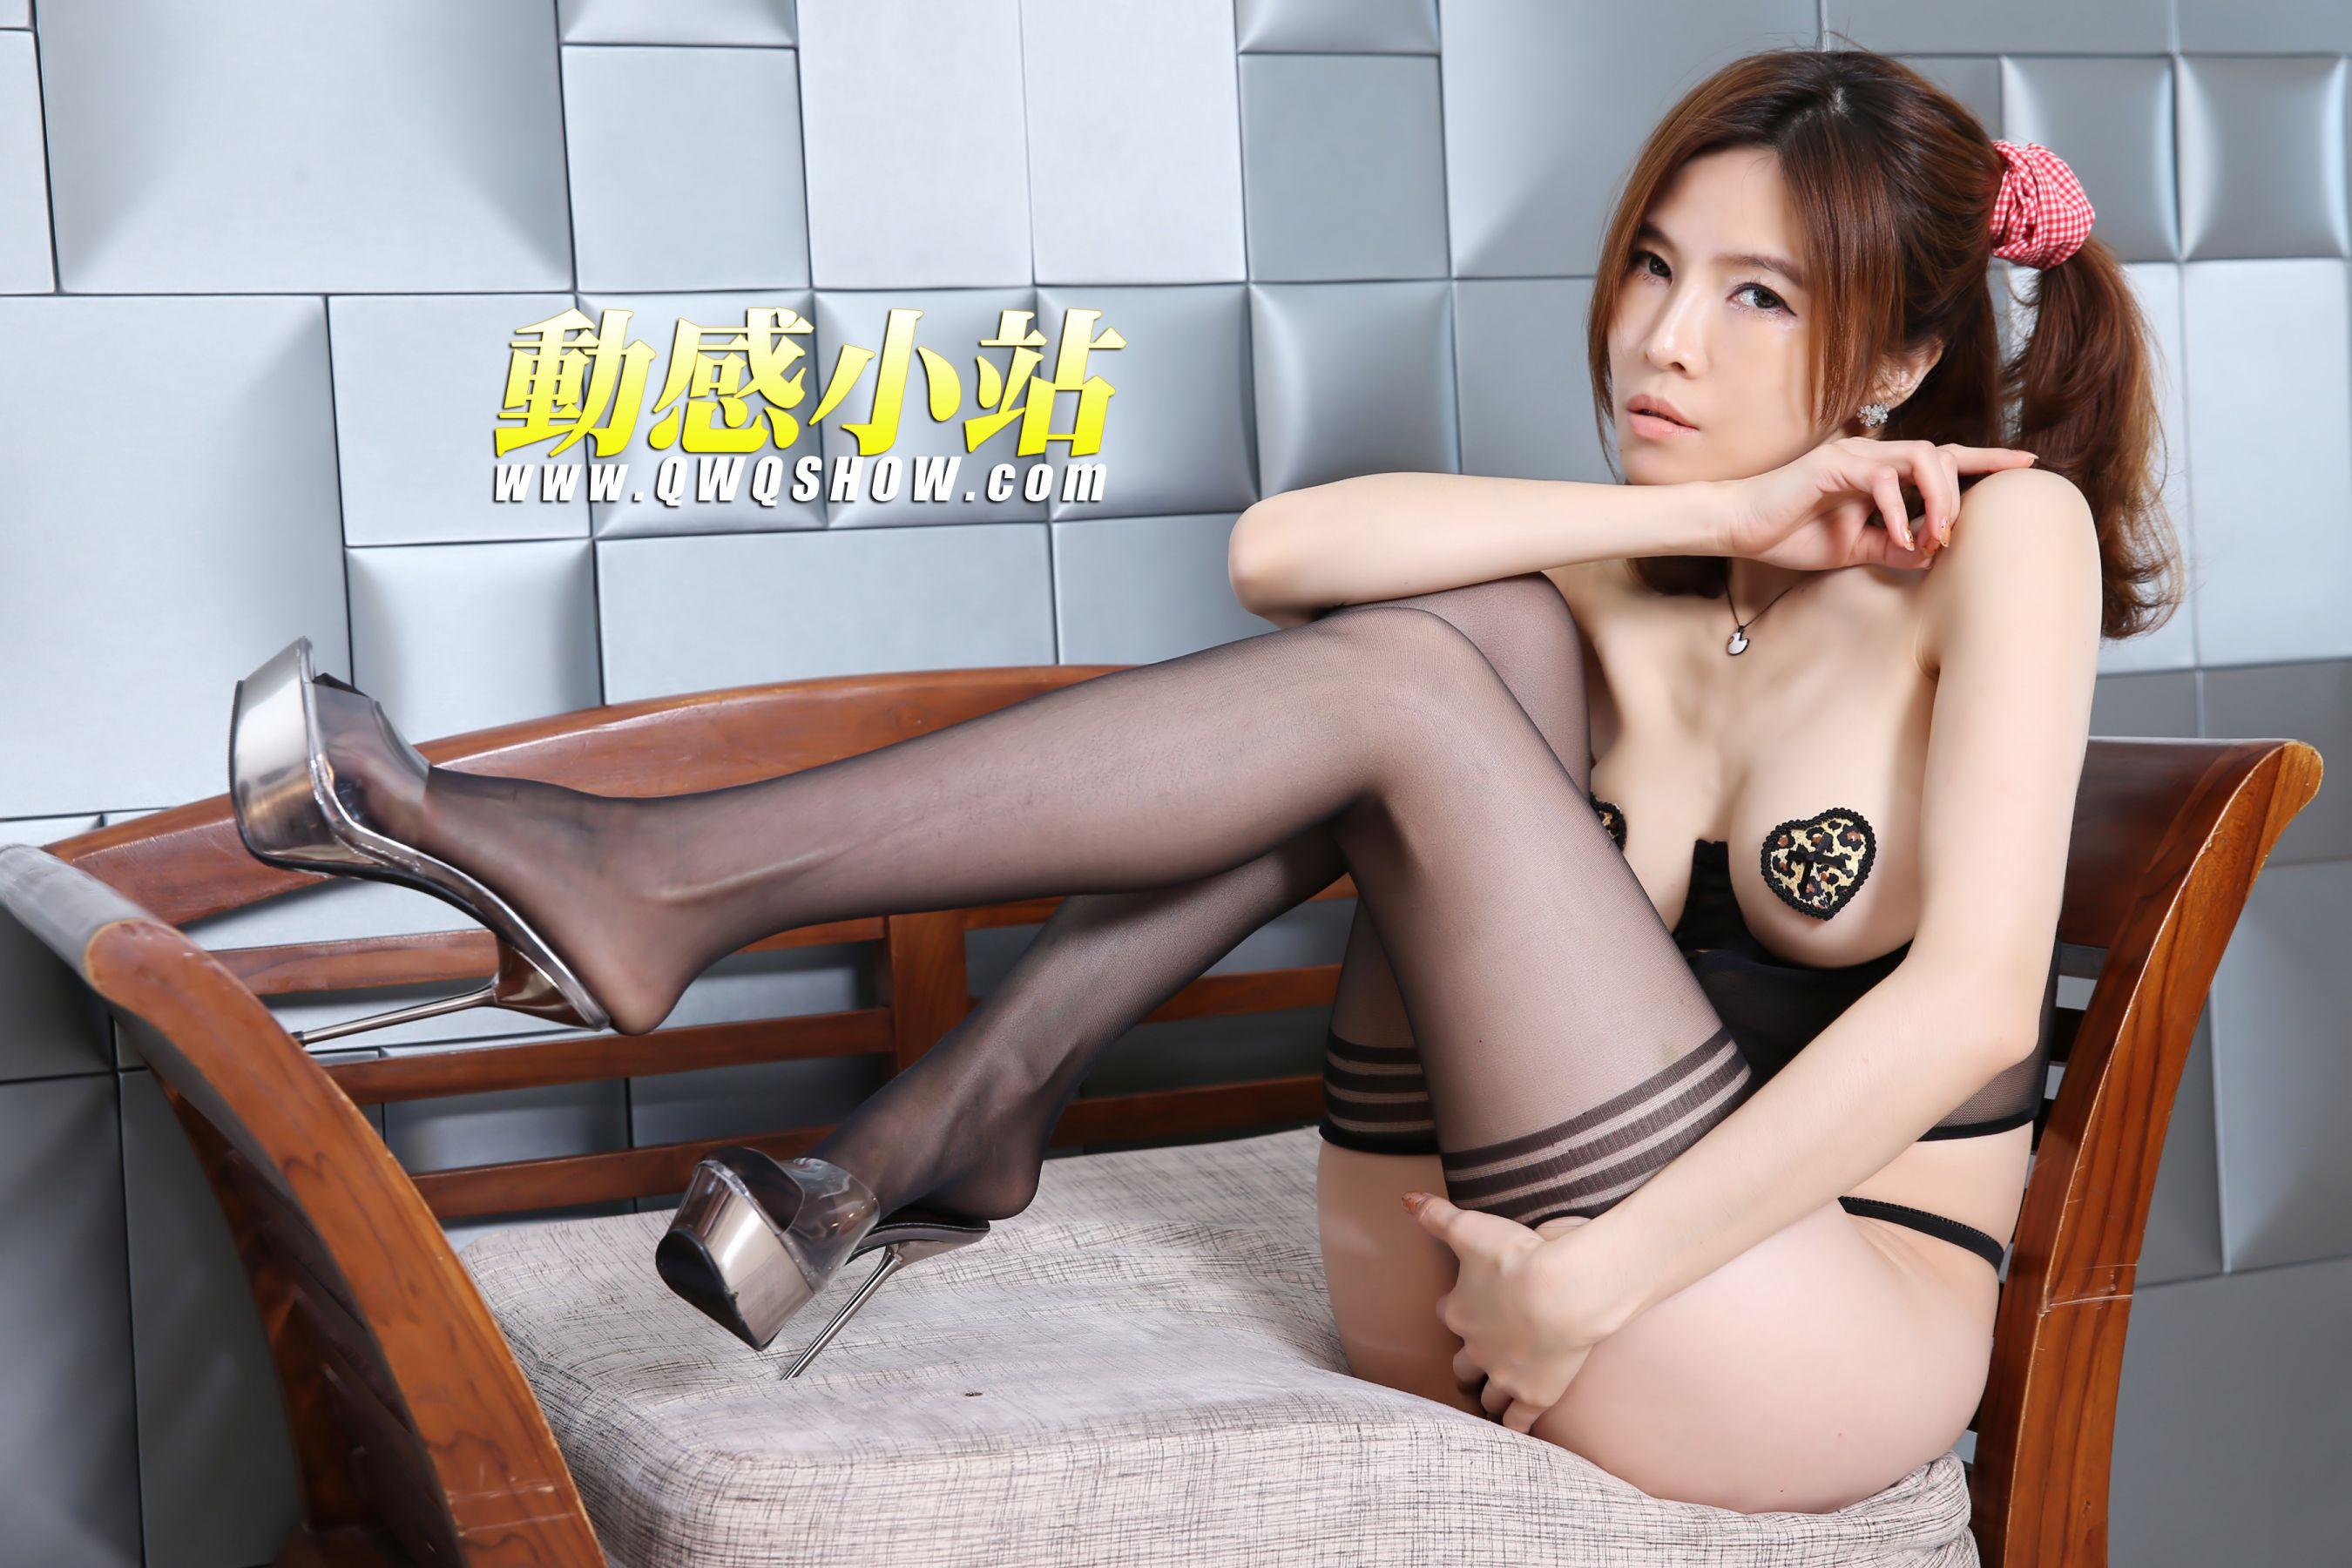 VOL.1265 [动感之星]丝袜诱惑:小玲(动感小站小玲,动感之星小玲)高品质写真套图(25P)